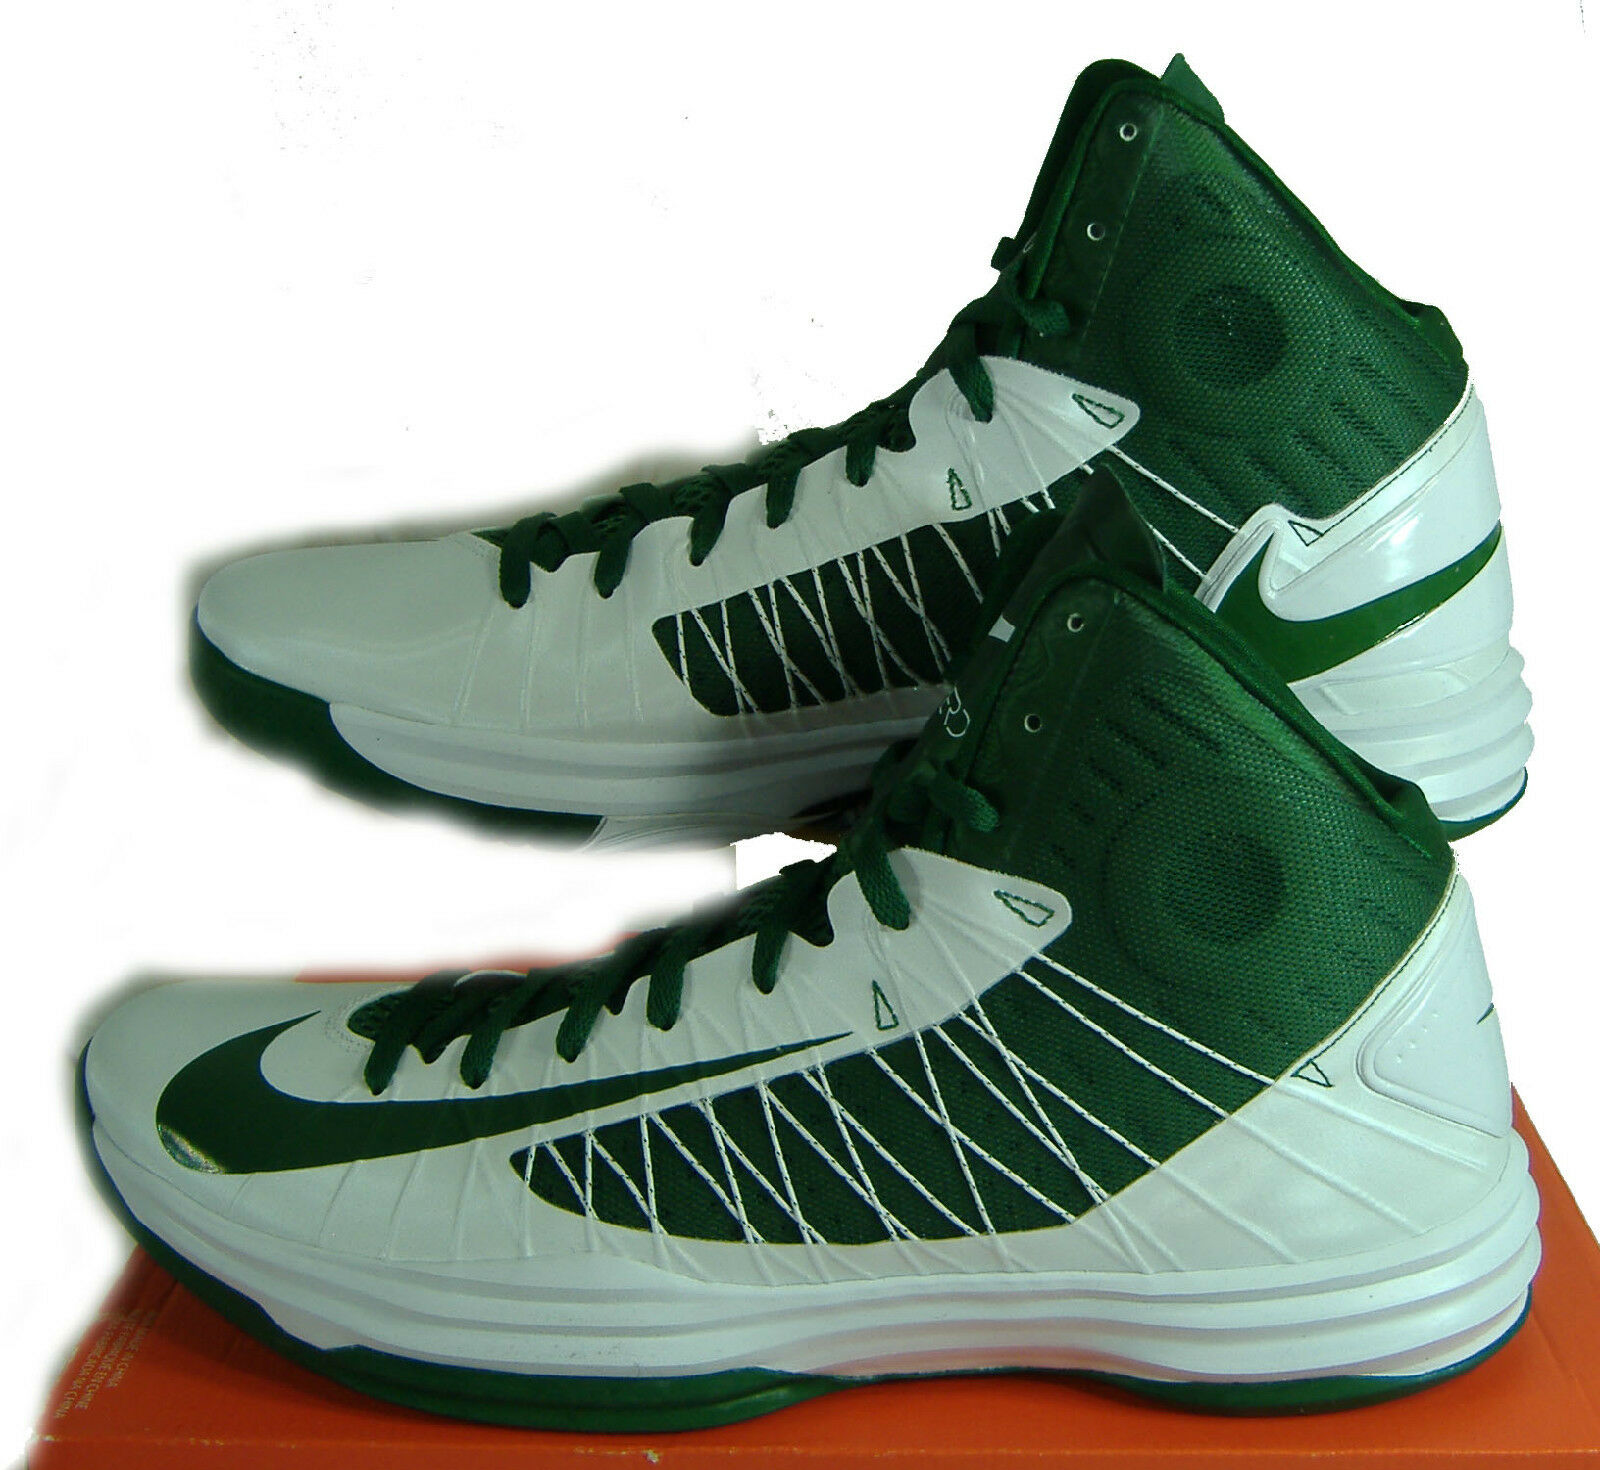 New Mens 17 NIKE Hyperdunk TB White Green High Top Shoes 125 524882-103